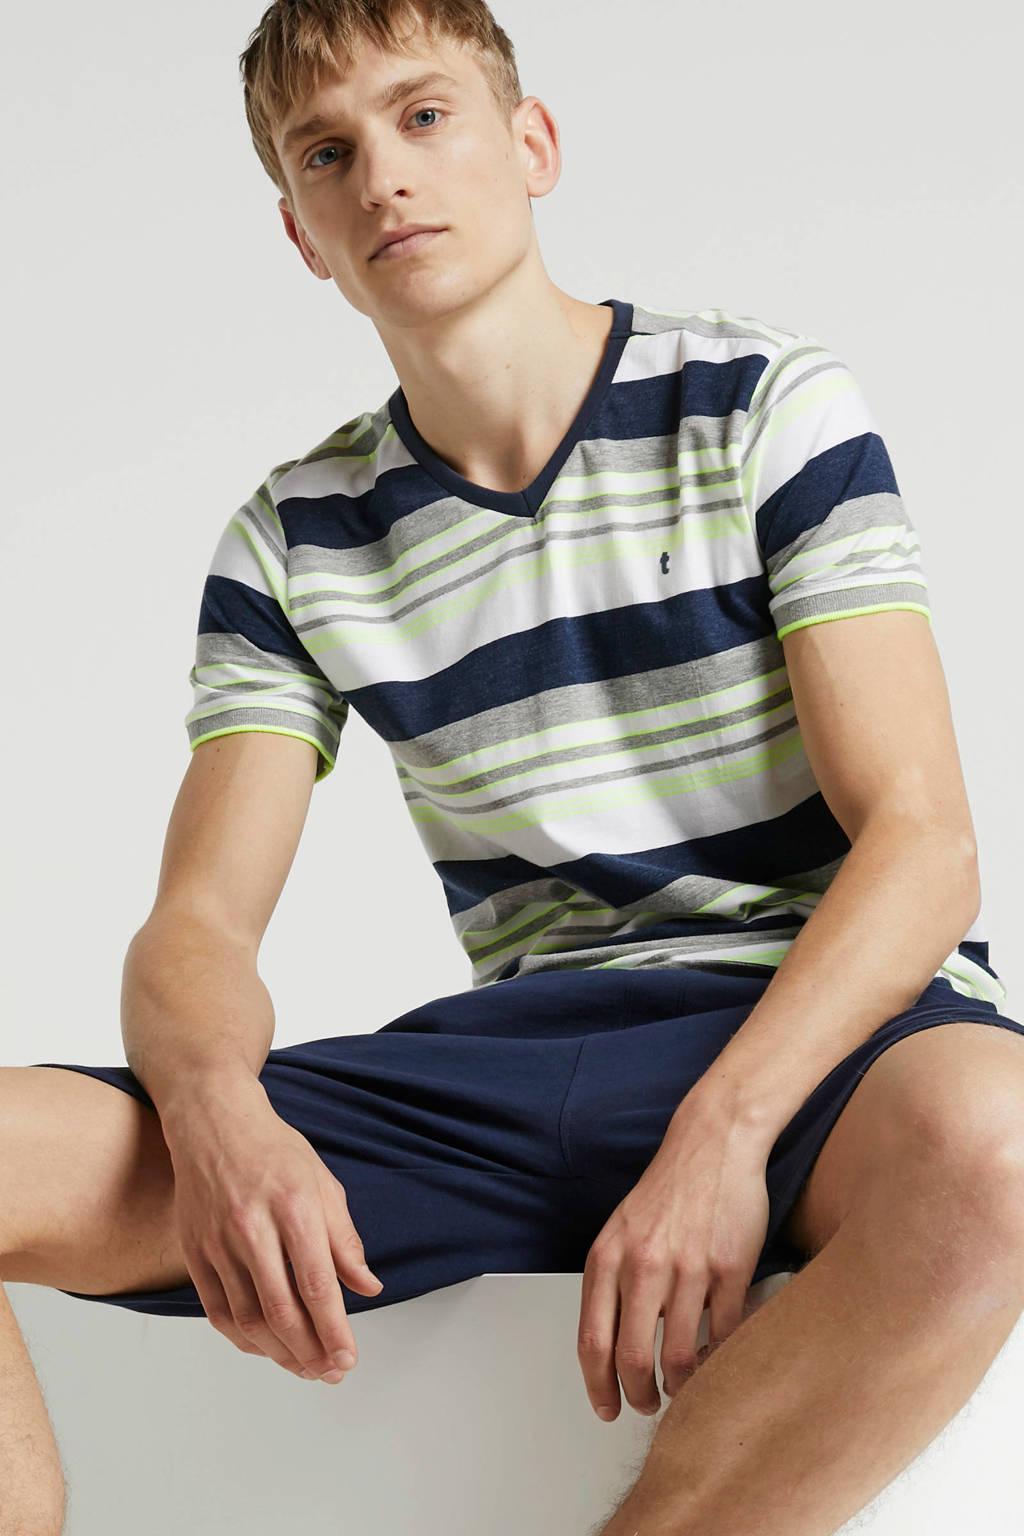 Twinlife T-shirt, Blauw/grijs/wit